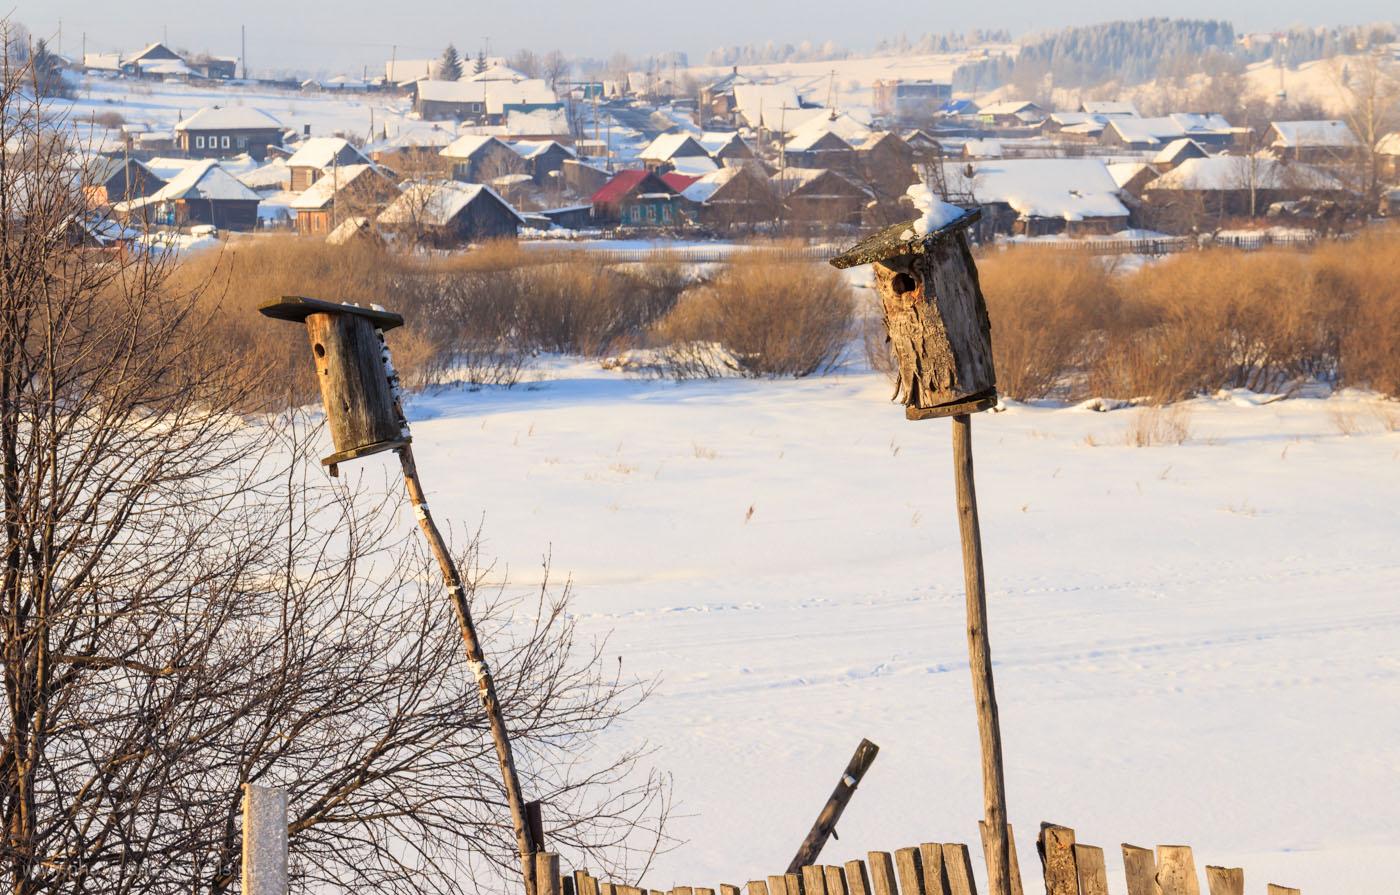 Фотография 28. Репортаж на зеркалку Canon EOS. Тестирование фотоаппарата. 1/80, +0.67, 11.